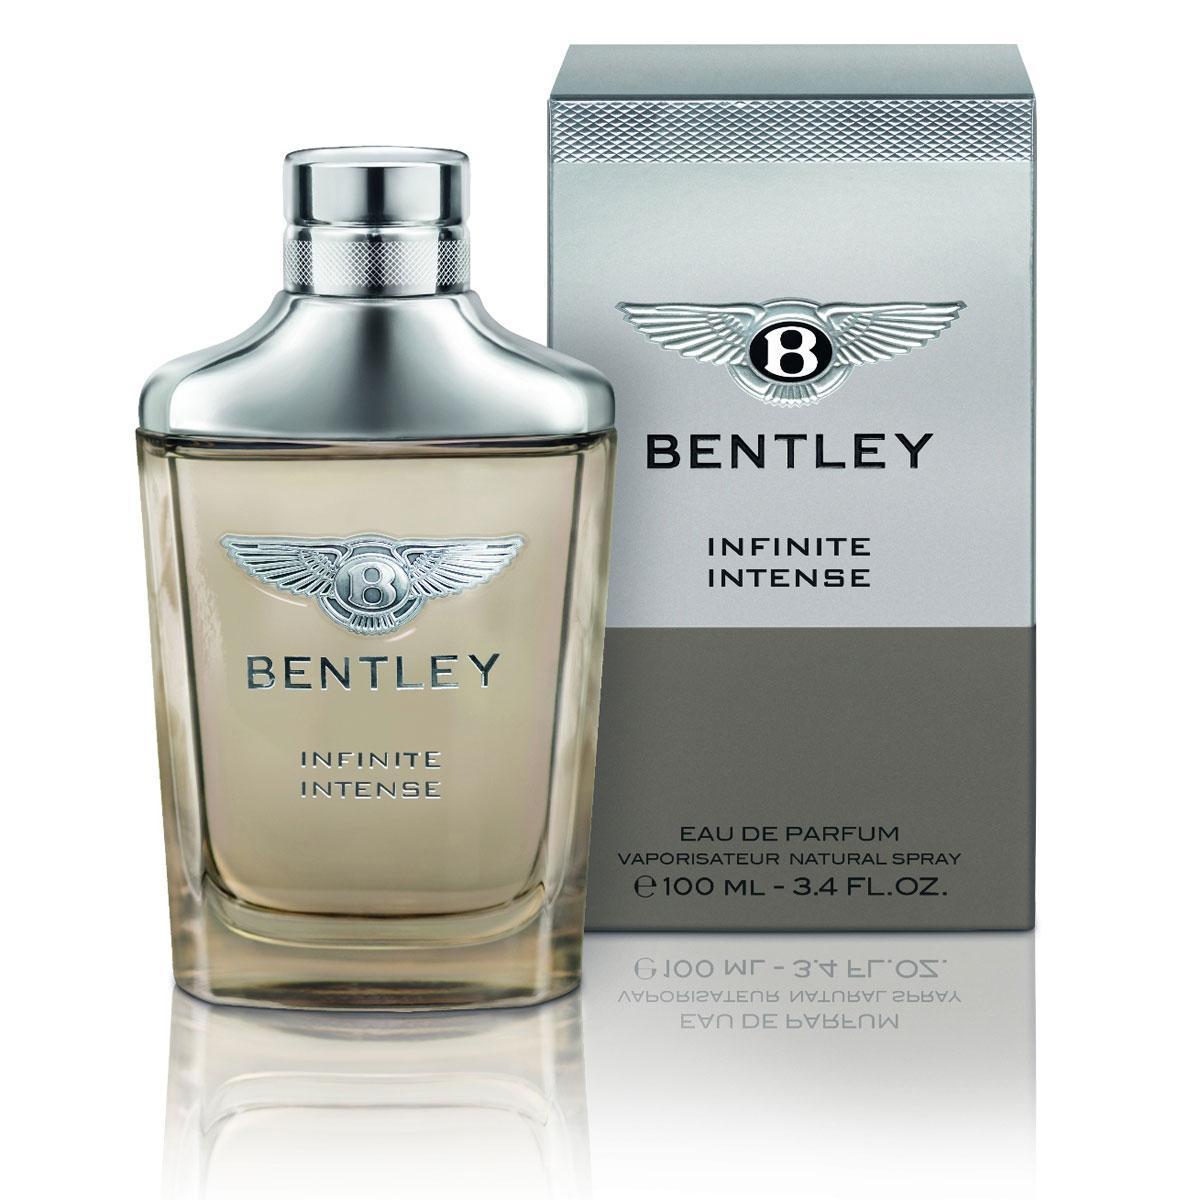 Bentley Infinite Intense EDP 100 ml Erkek Parfüm